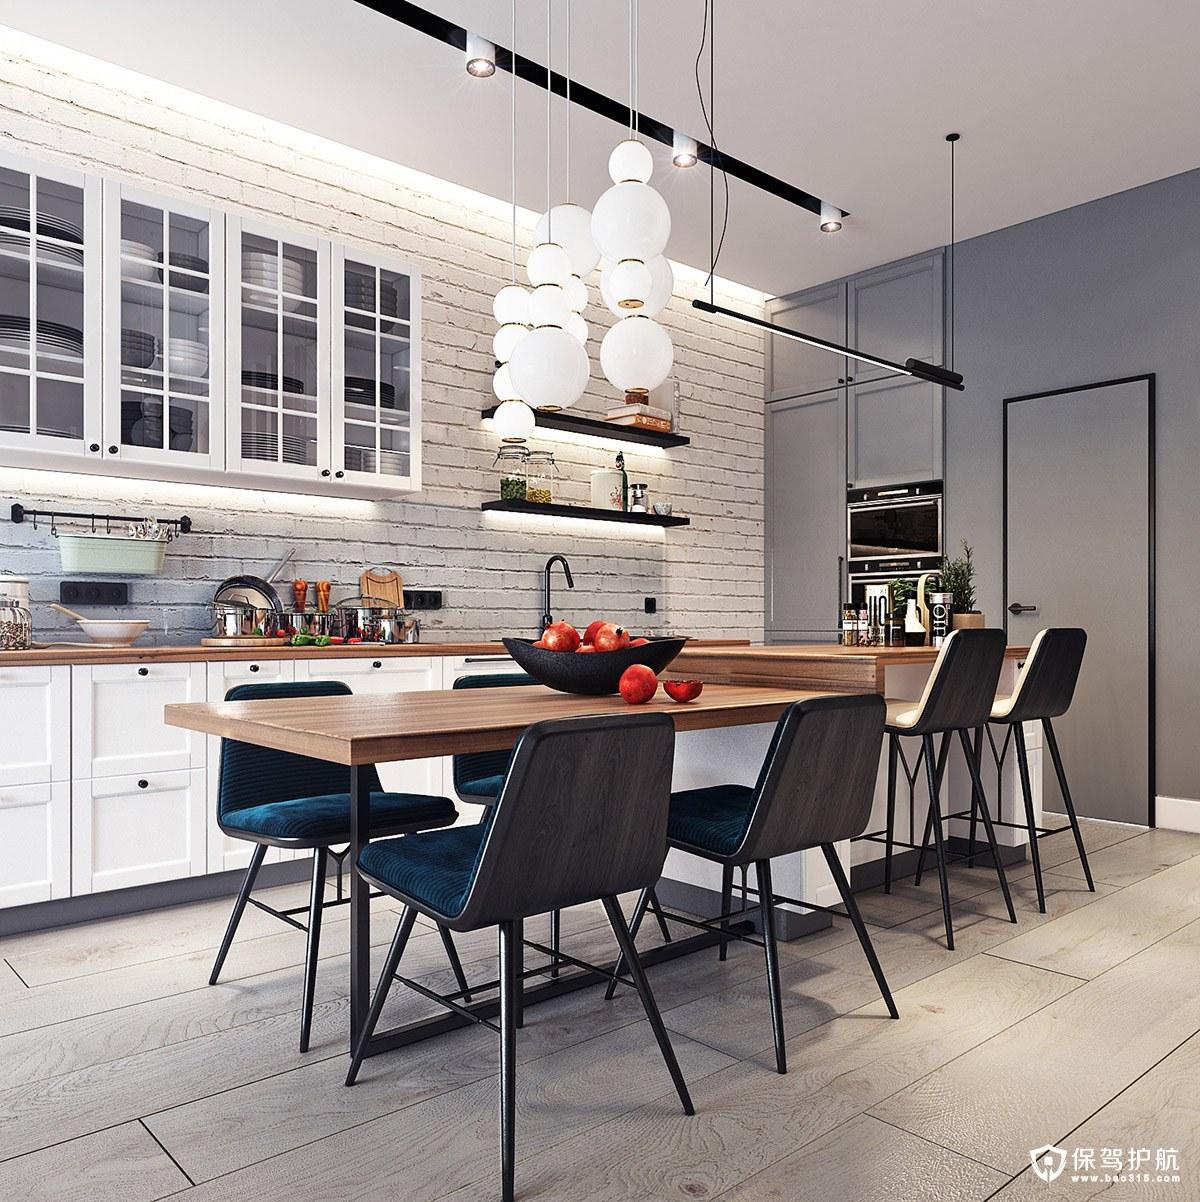 navy blue kitchen decor cabinets online 小户型设计 极简主义风格的小户型装修 生活的蓝色绿洲 轻木台面和白砖后挡板与这间厨房的海军蓝色椅子形成鲜明对比